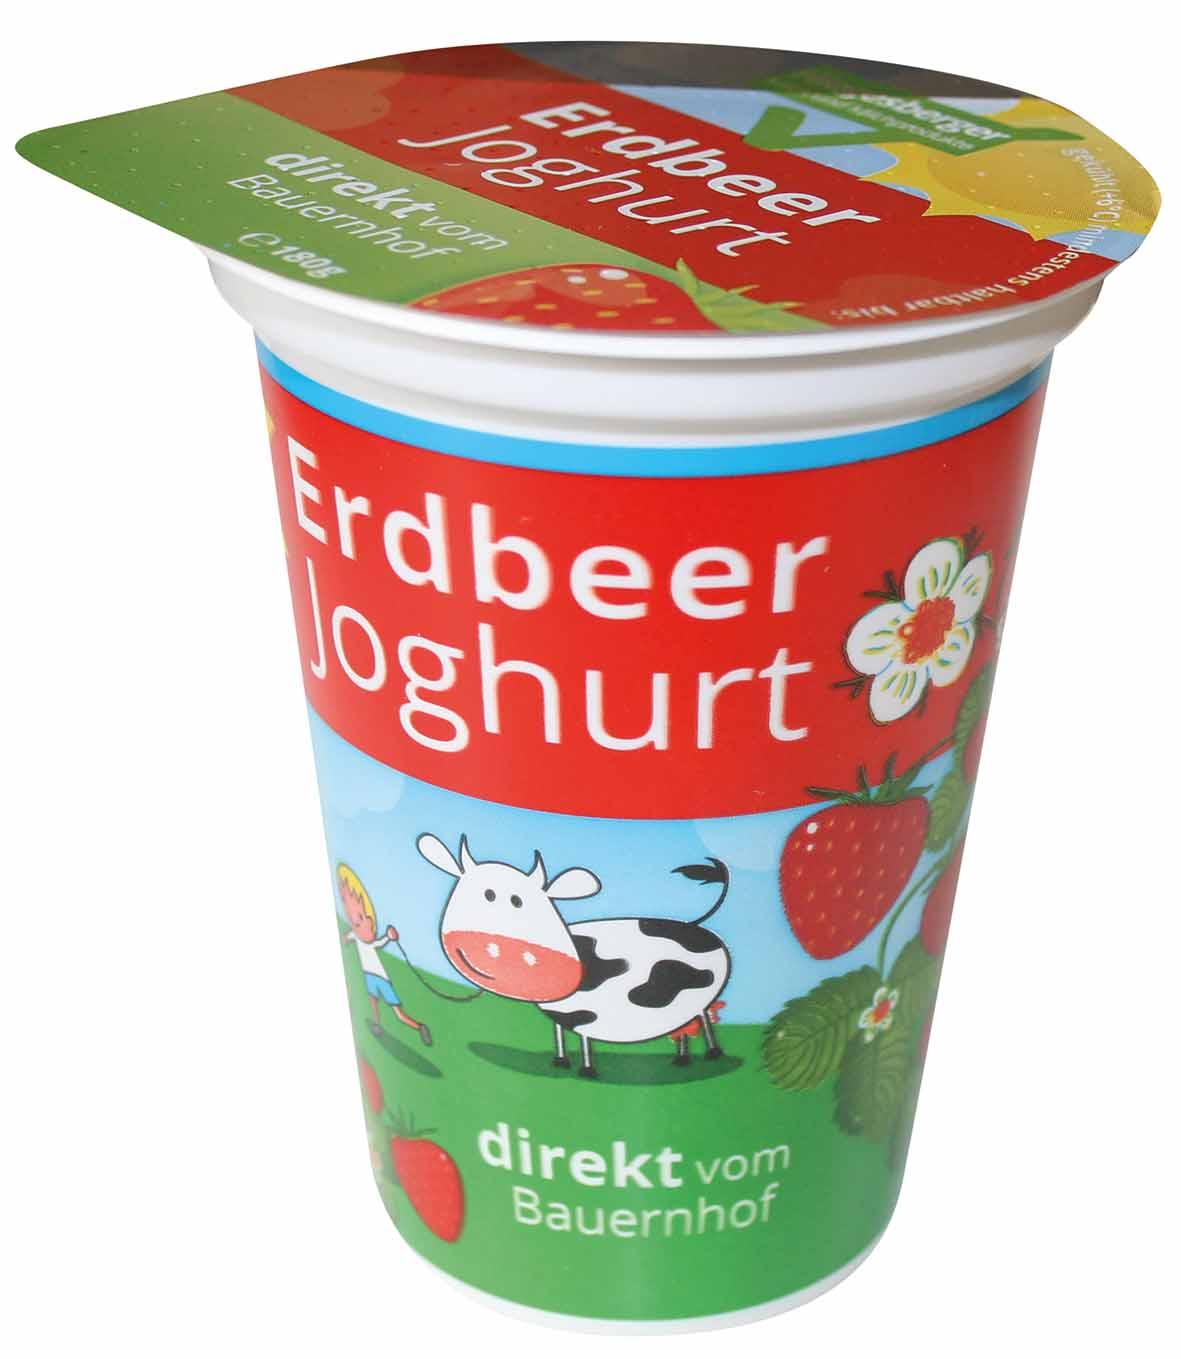 Hiegesberger_Erdbeerjoghurt_180g